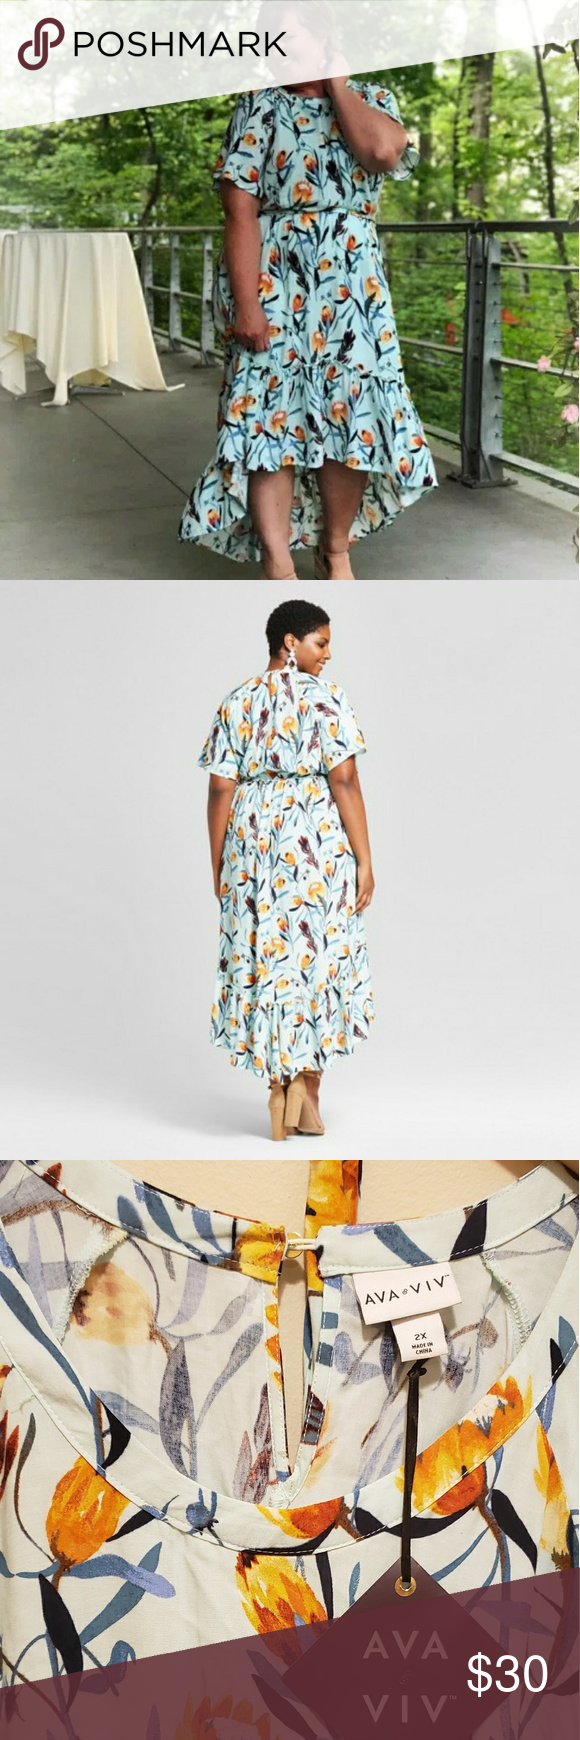 Ava Viv 2x Target Blue High Low Floral Dress Floral High Low Dress Dresses Floral Dress [ 1740 x 580 Pixel ]